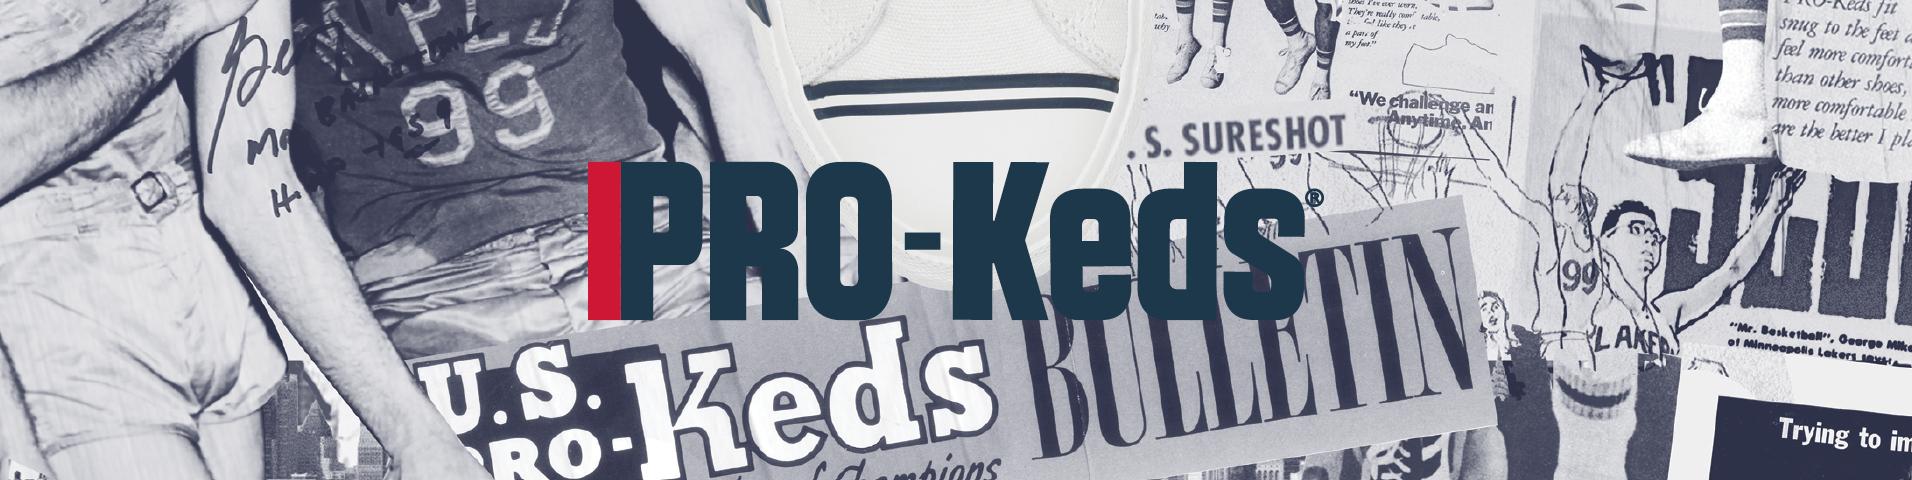 Pro Keds Online Shop | Pro Keds versandkostenfrei bei Zalando.at